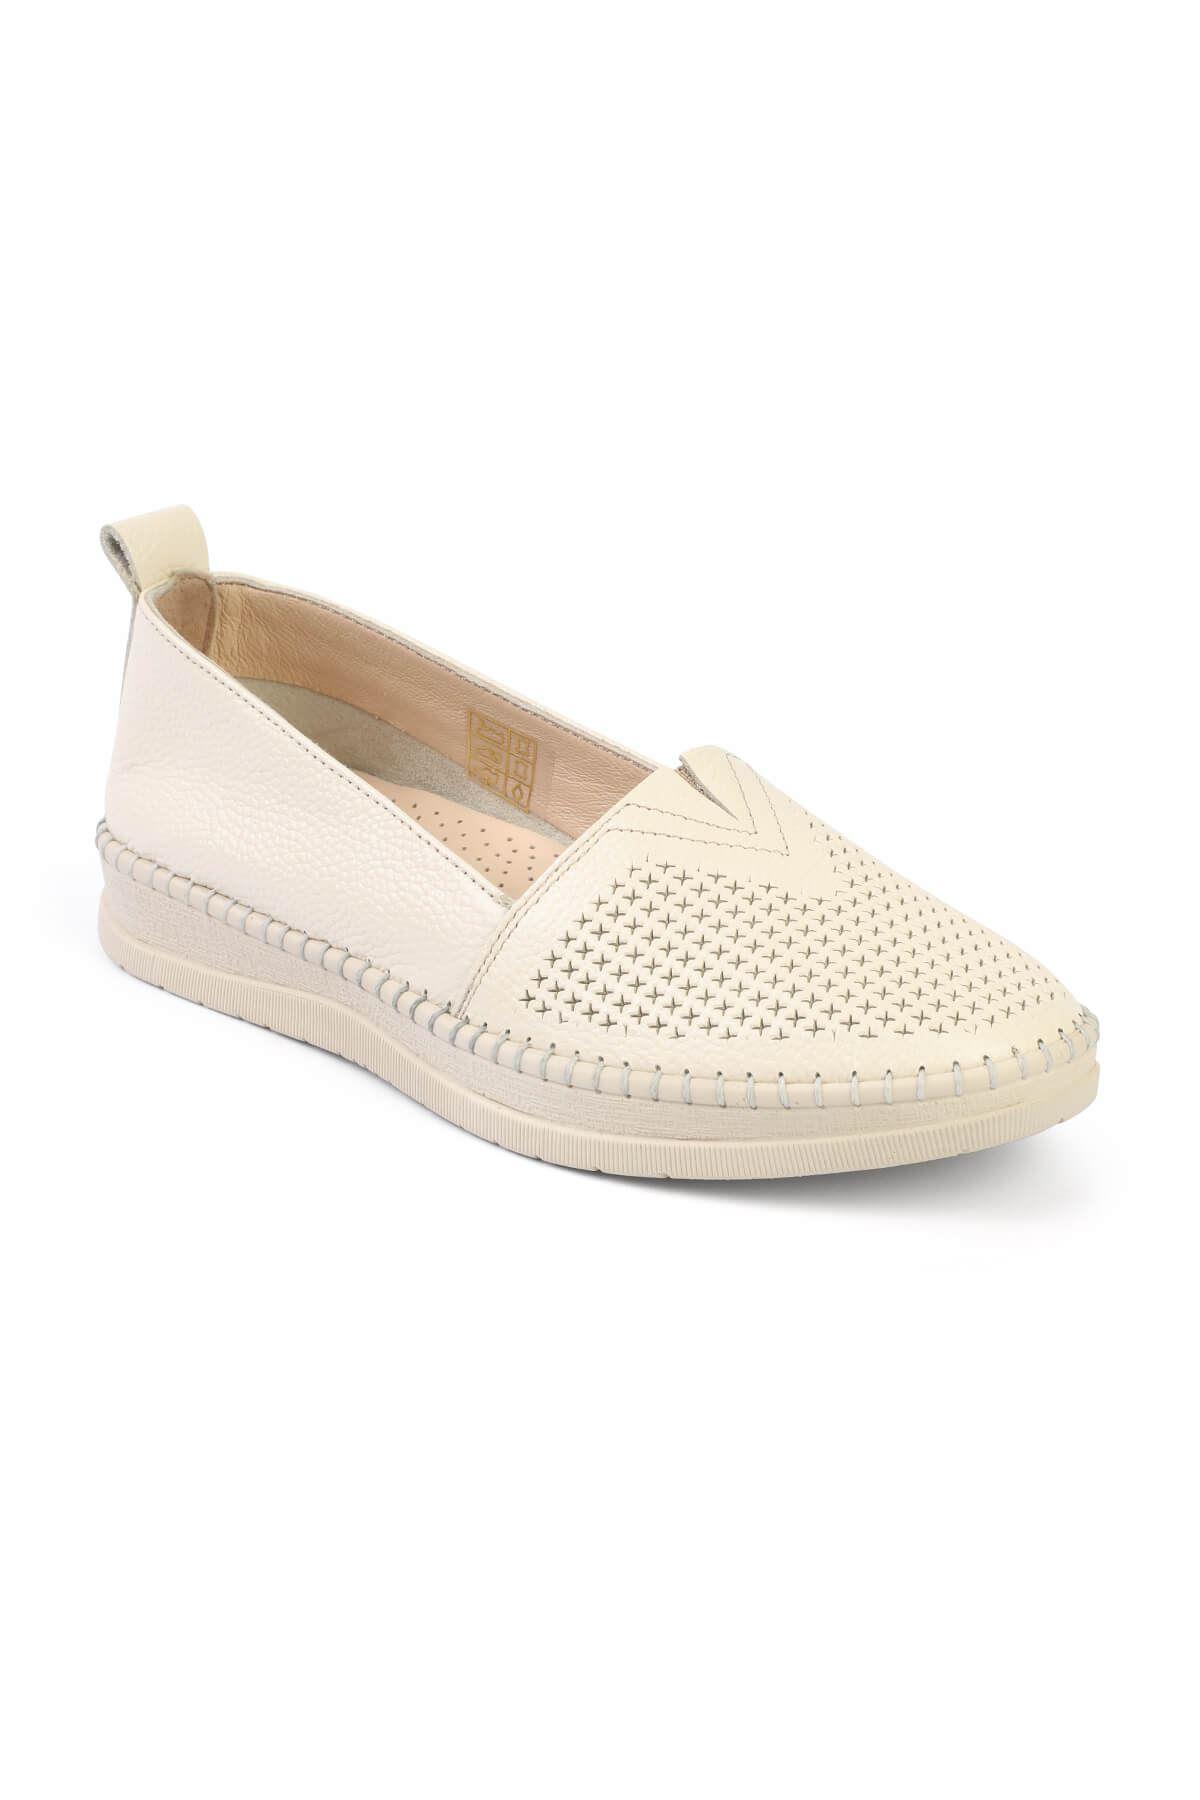 Libero FMS240 Powder Espadrile Shoes